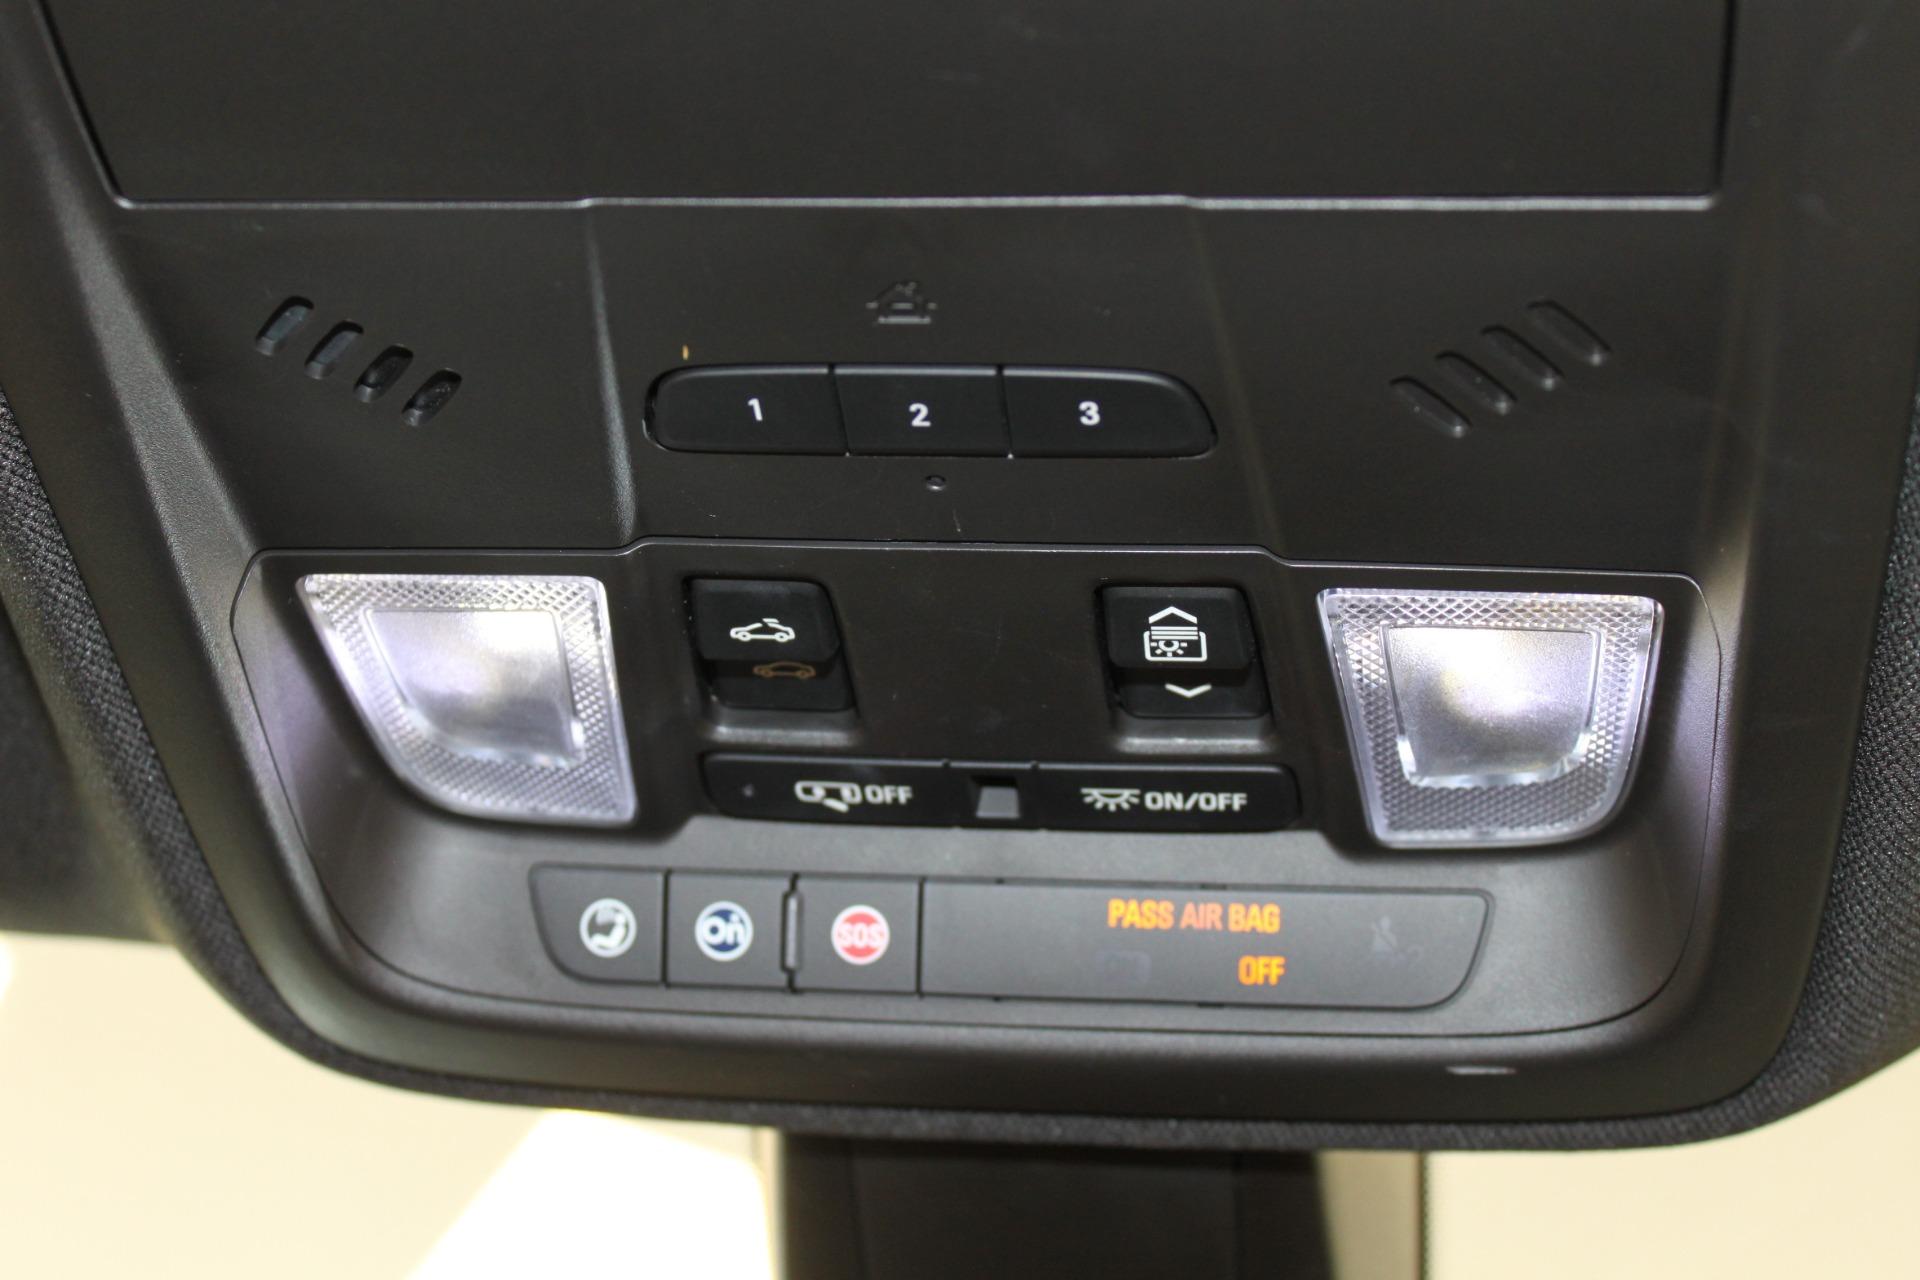 Used-2017-Cadillac-XT5-Luxury-All-Wheel-Drive-Luxury-AWD-Audi